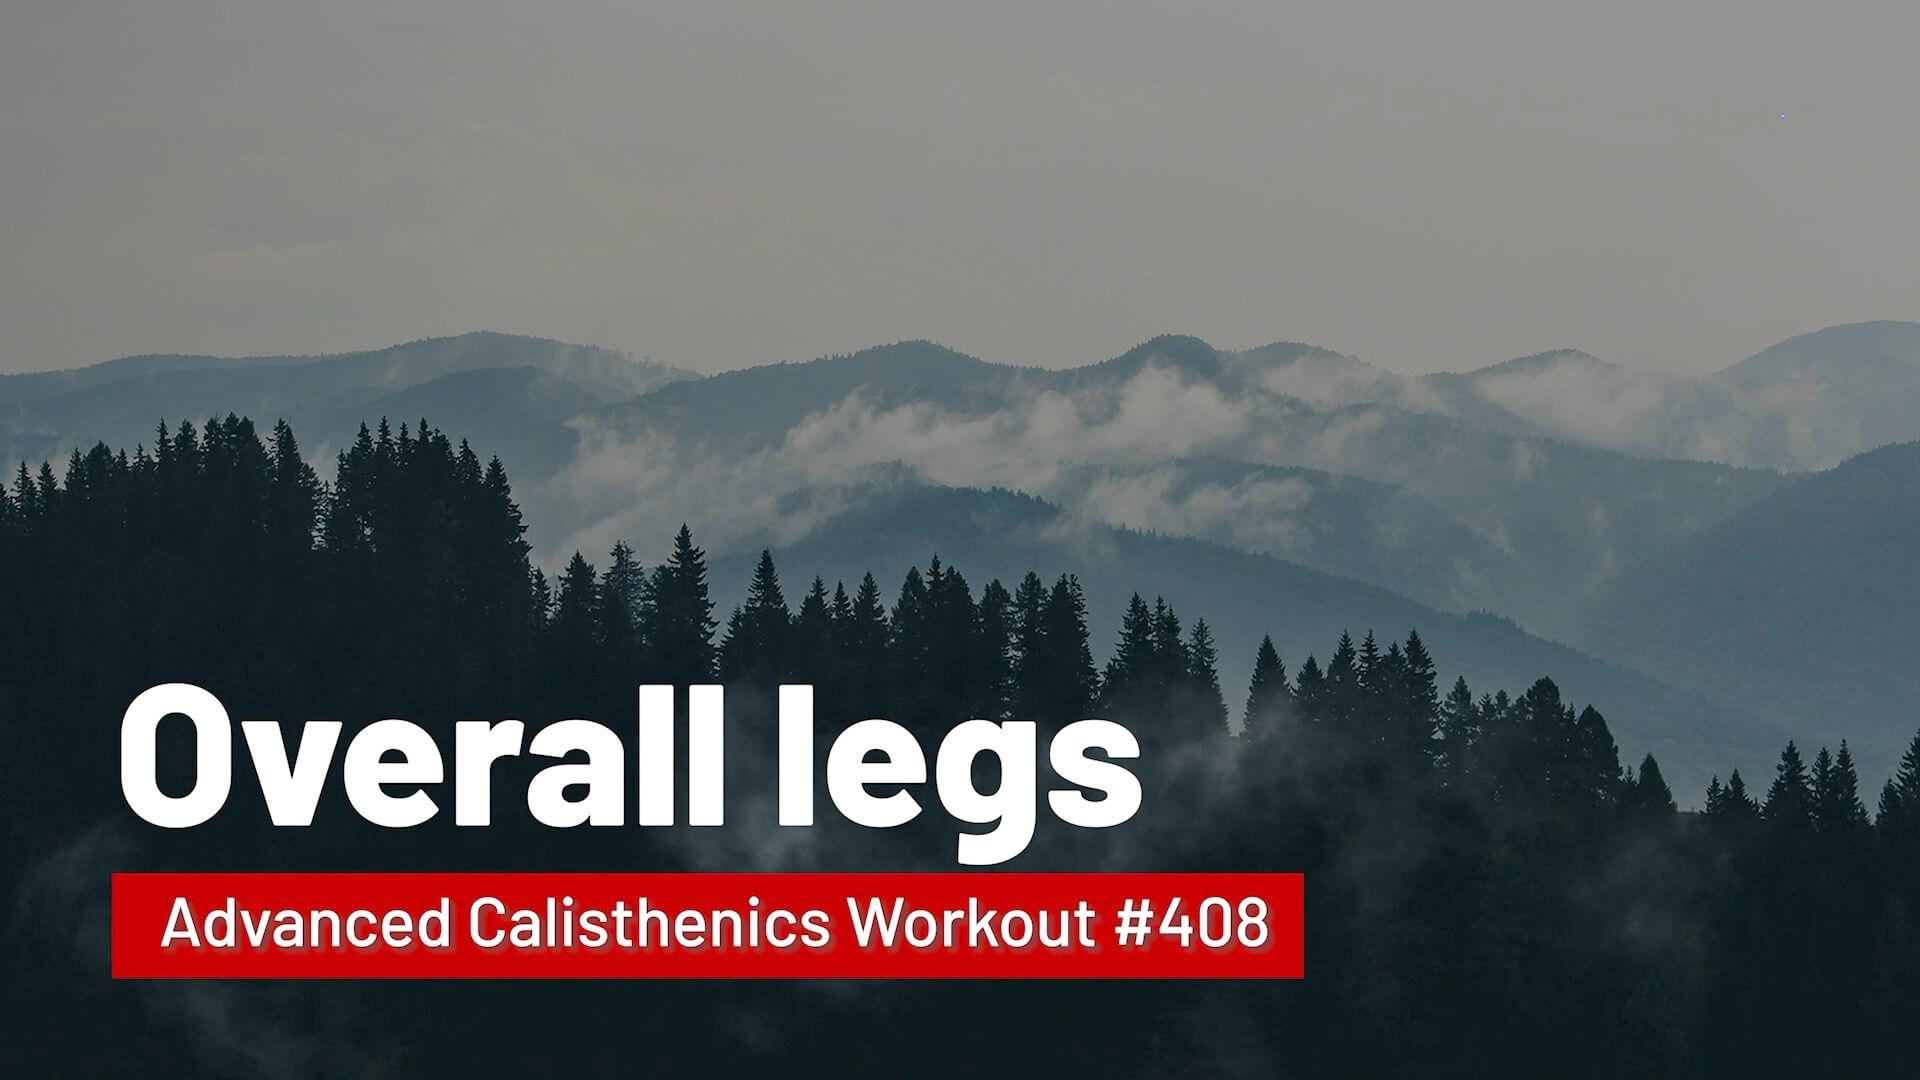 Workout #408